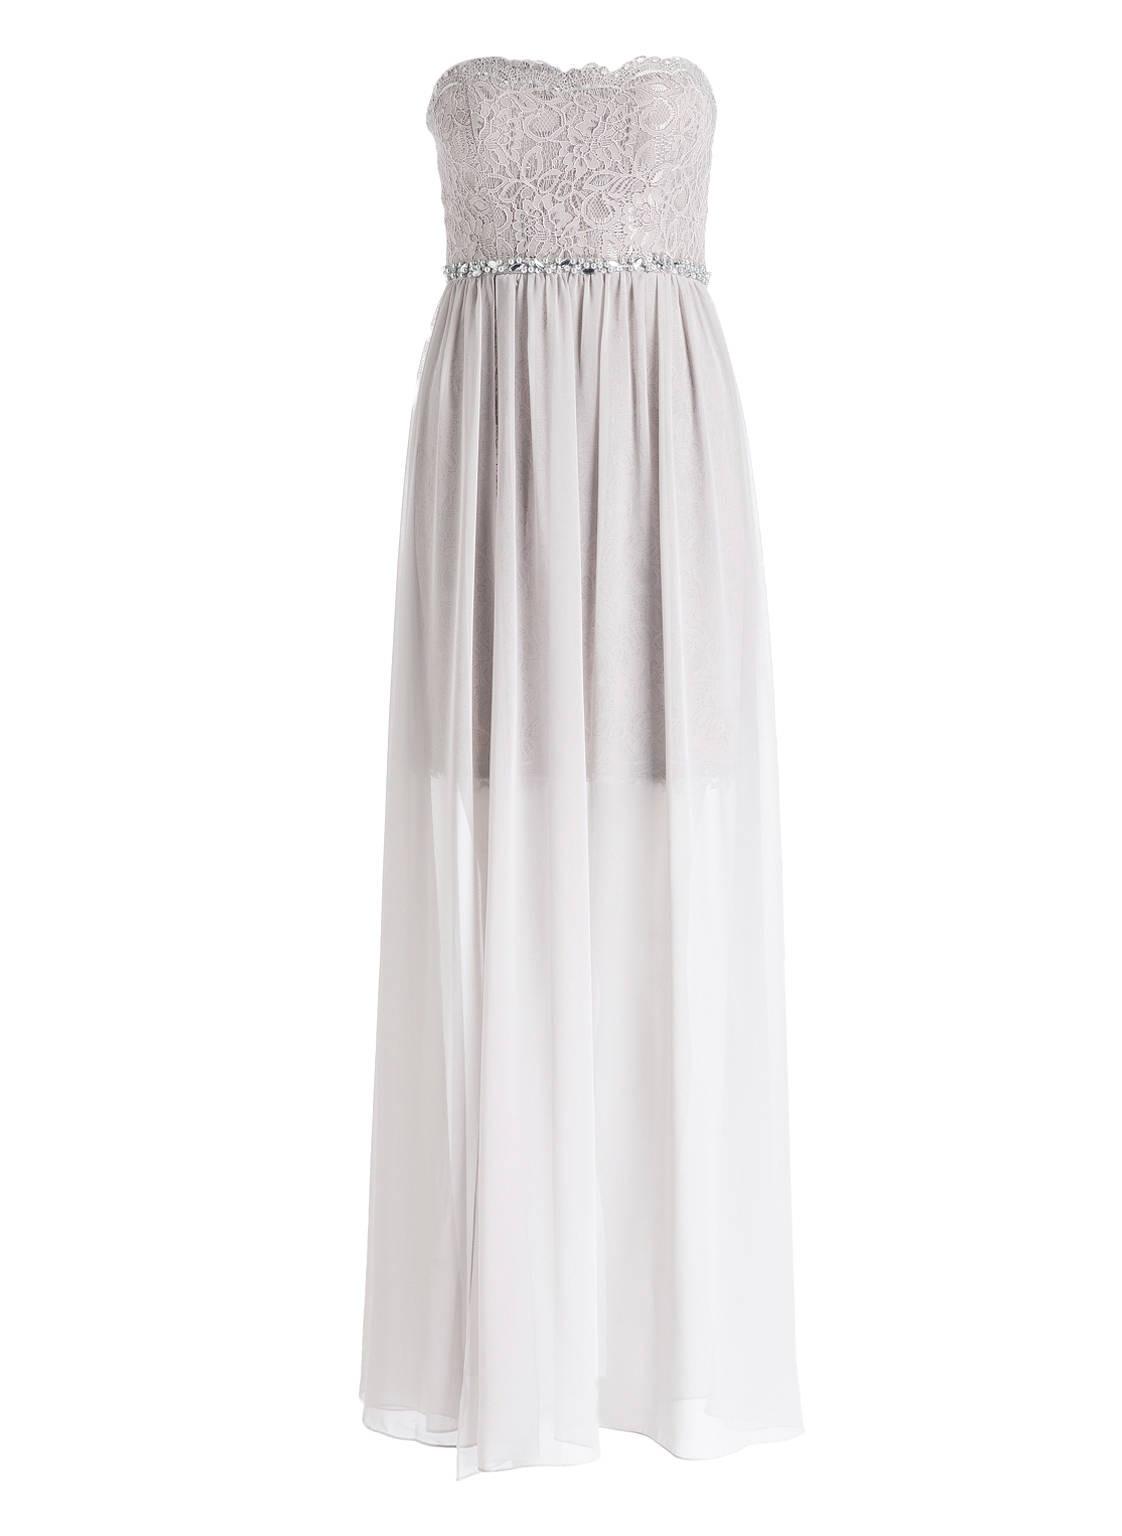 13 Genial Kleid Abendkleid GalerieDesigner Luxus Kleid Abendkleid Stylish